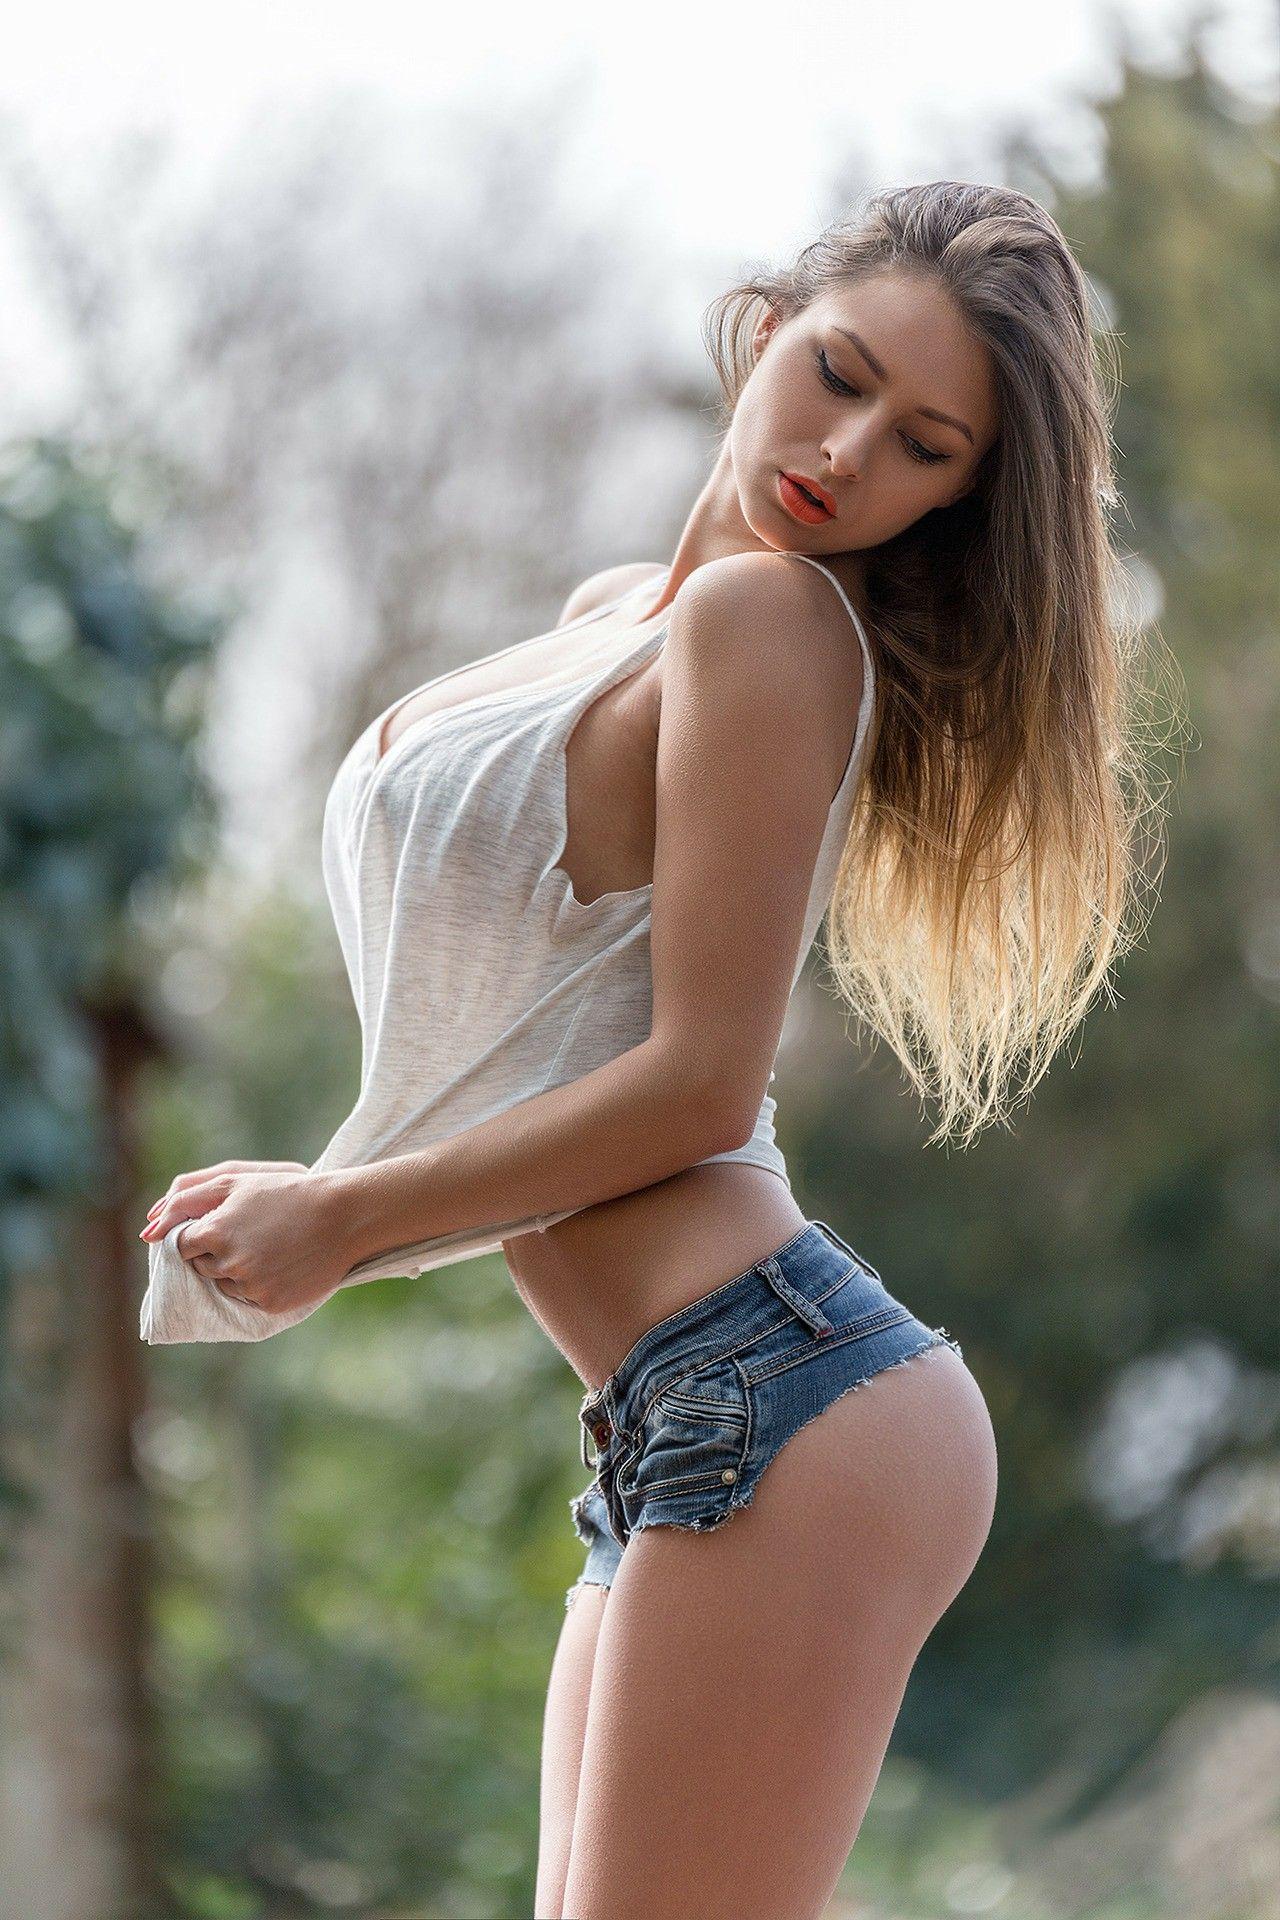 Talk to hot women online